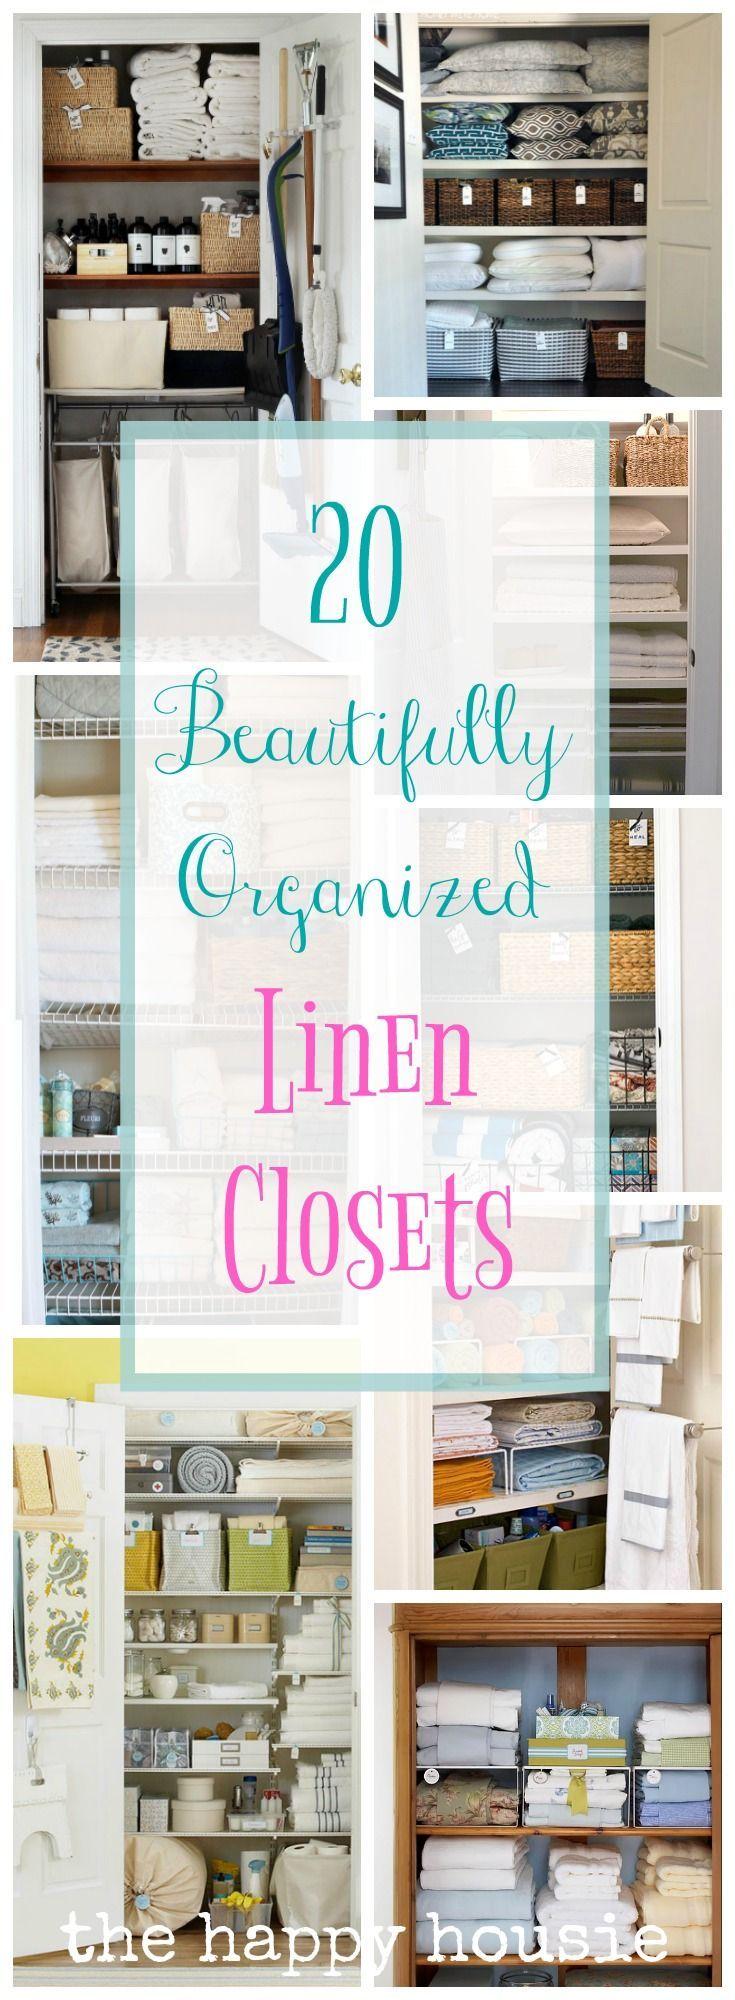 528 best Organizing Tips images on Pinterest | Organization ideas ...